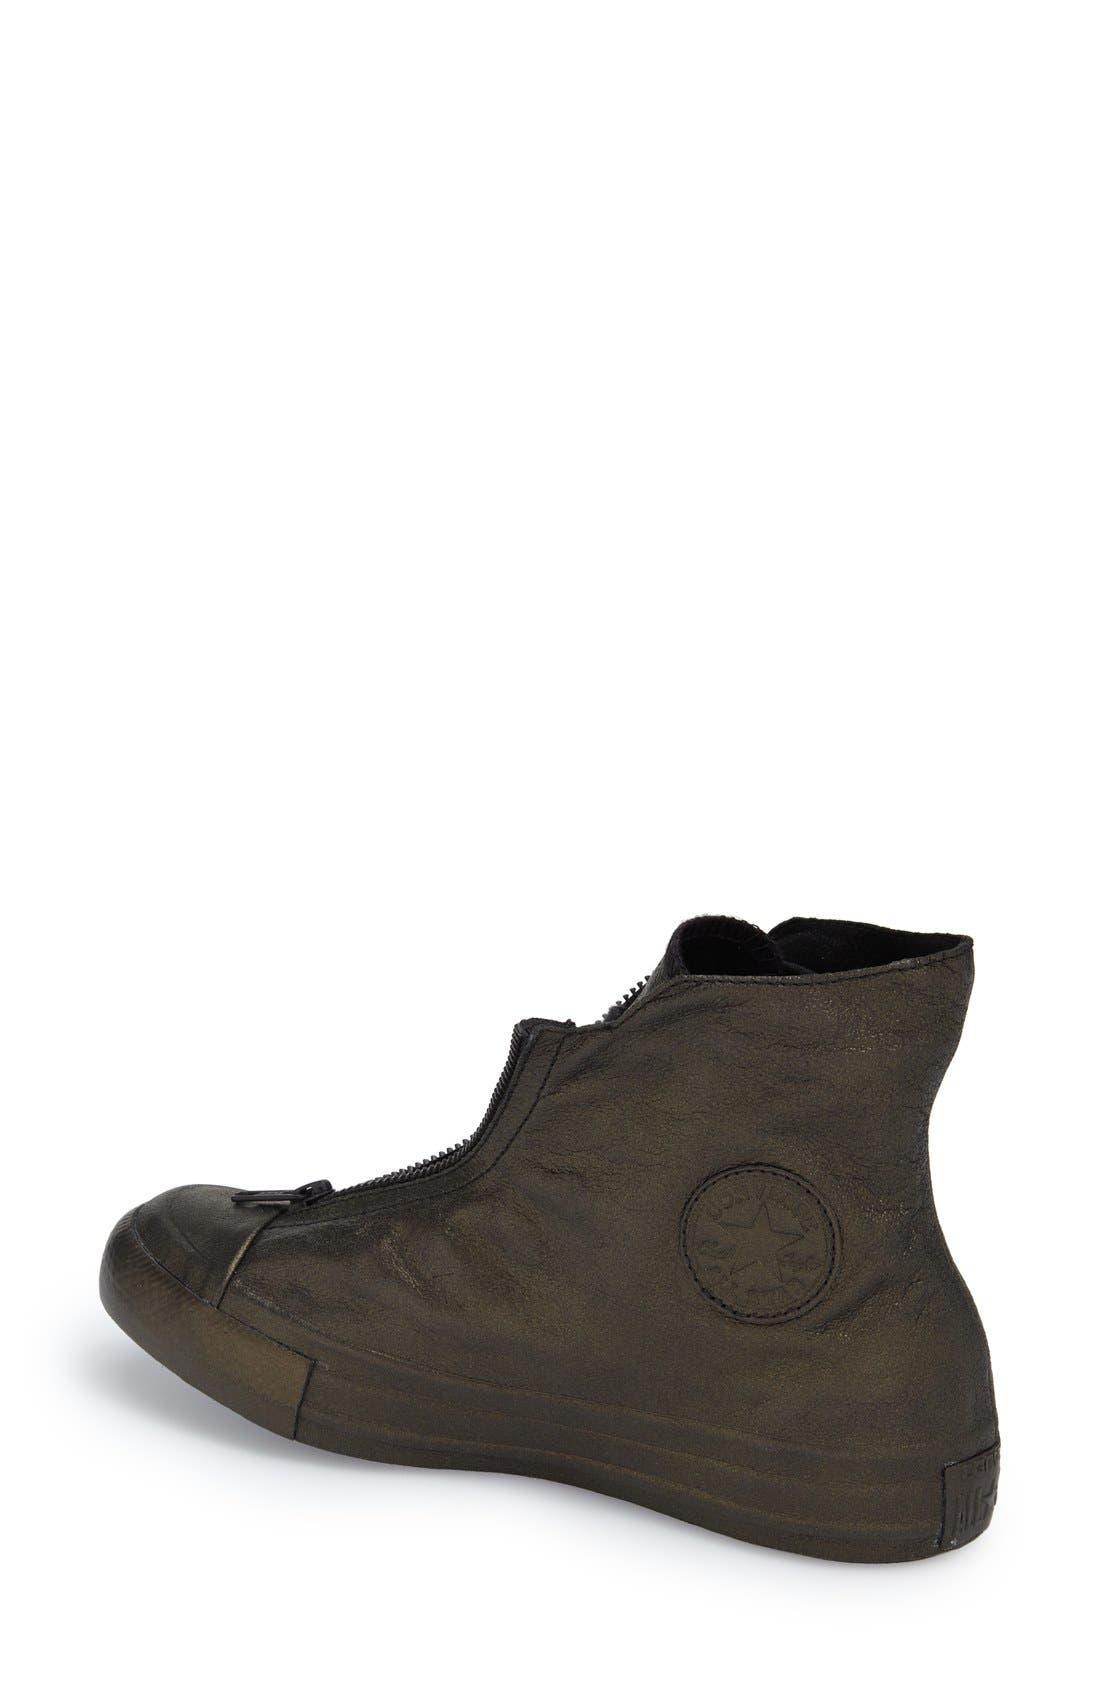 CONVERSE,                             Chuck Taylor<sup>®</sup> All Star<sup>®</sup> 'Shroud' Metallic High Top Sneaker,                             Alternate thumbnail 2, color,                             017